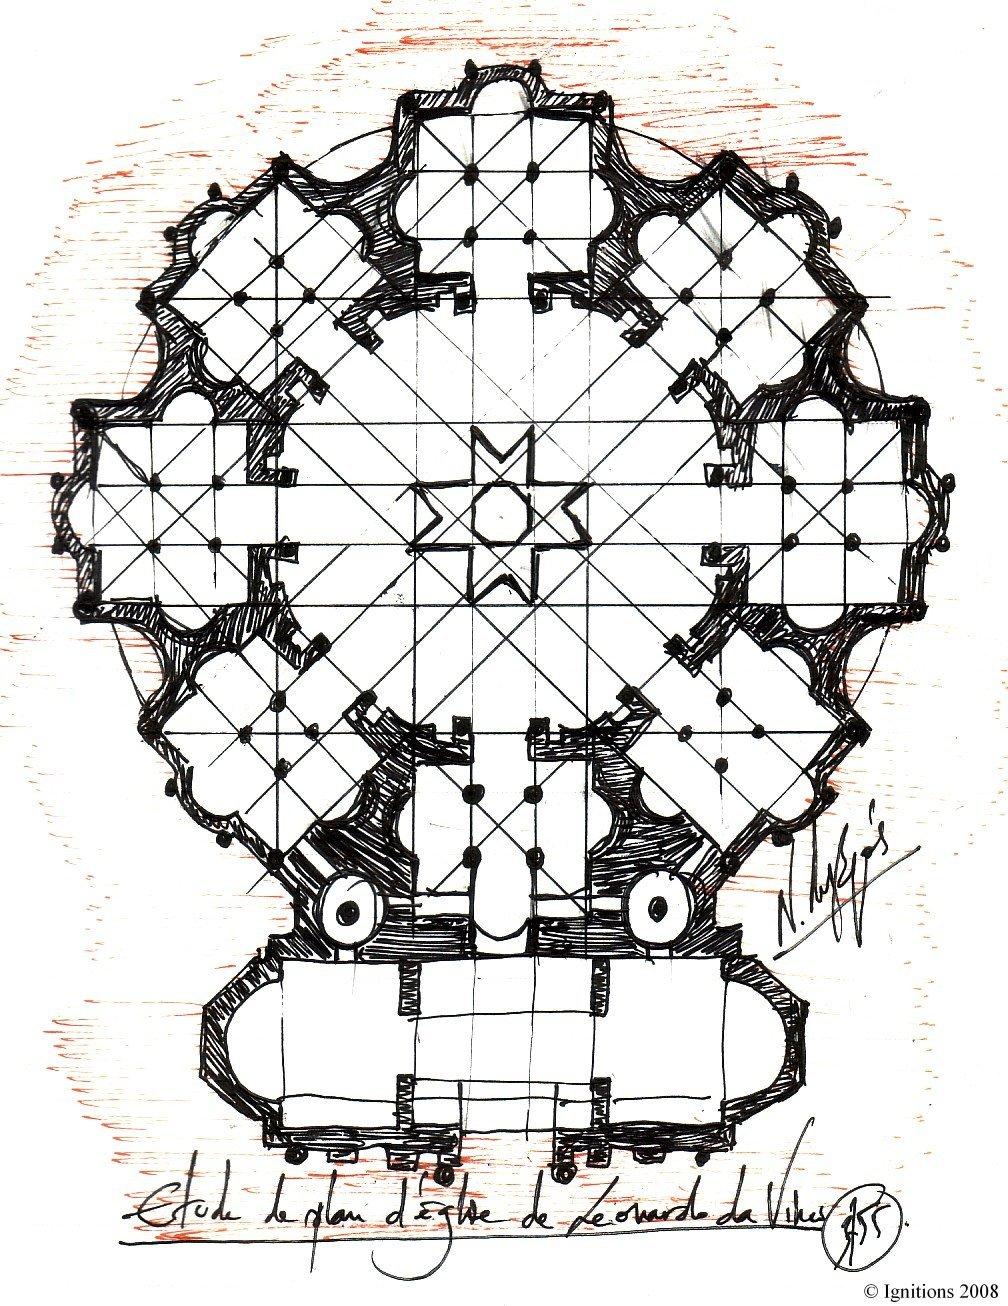 Etude de plan d'église de Leonardo da Vinci.